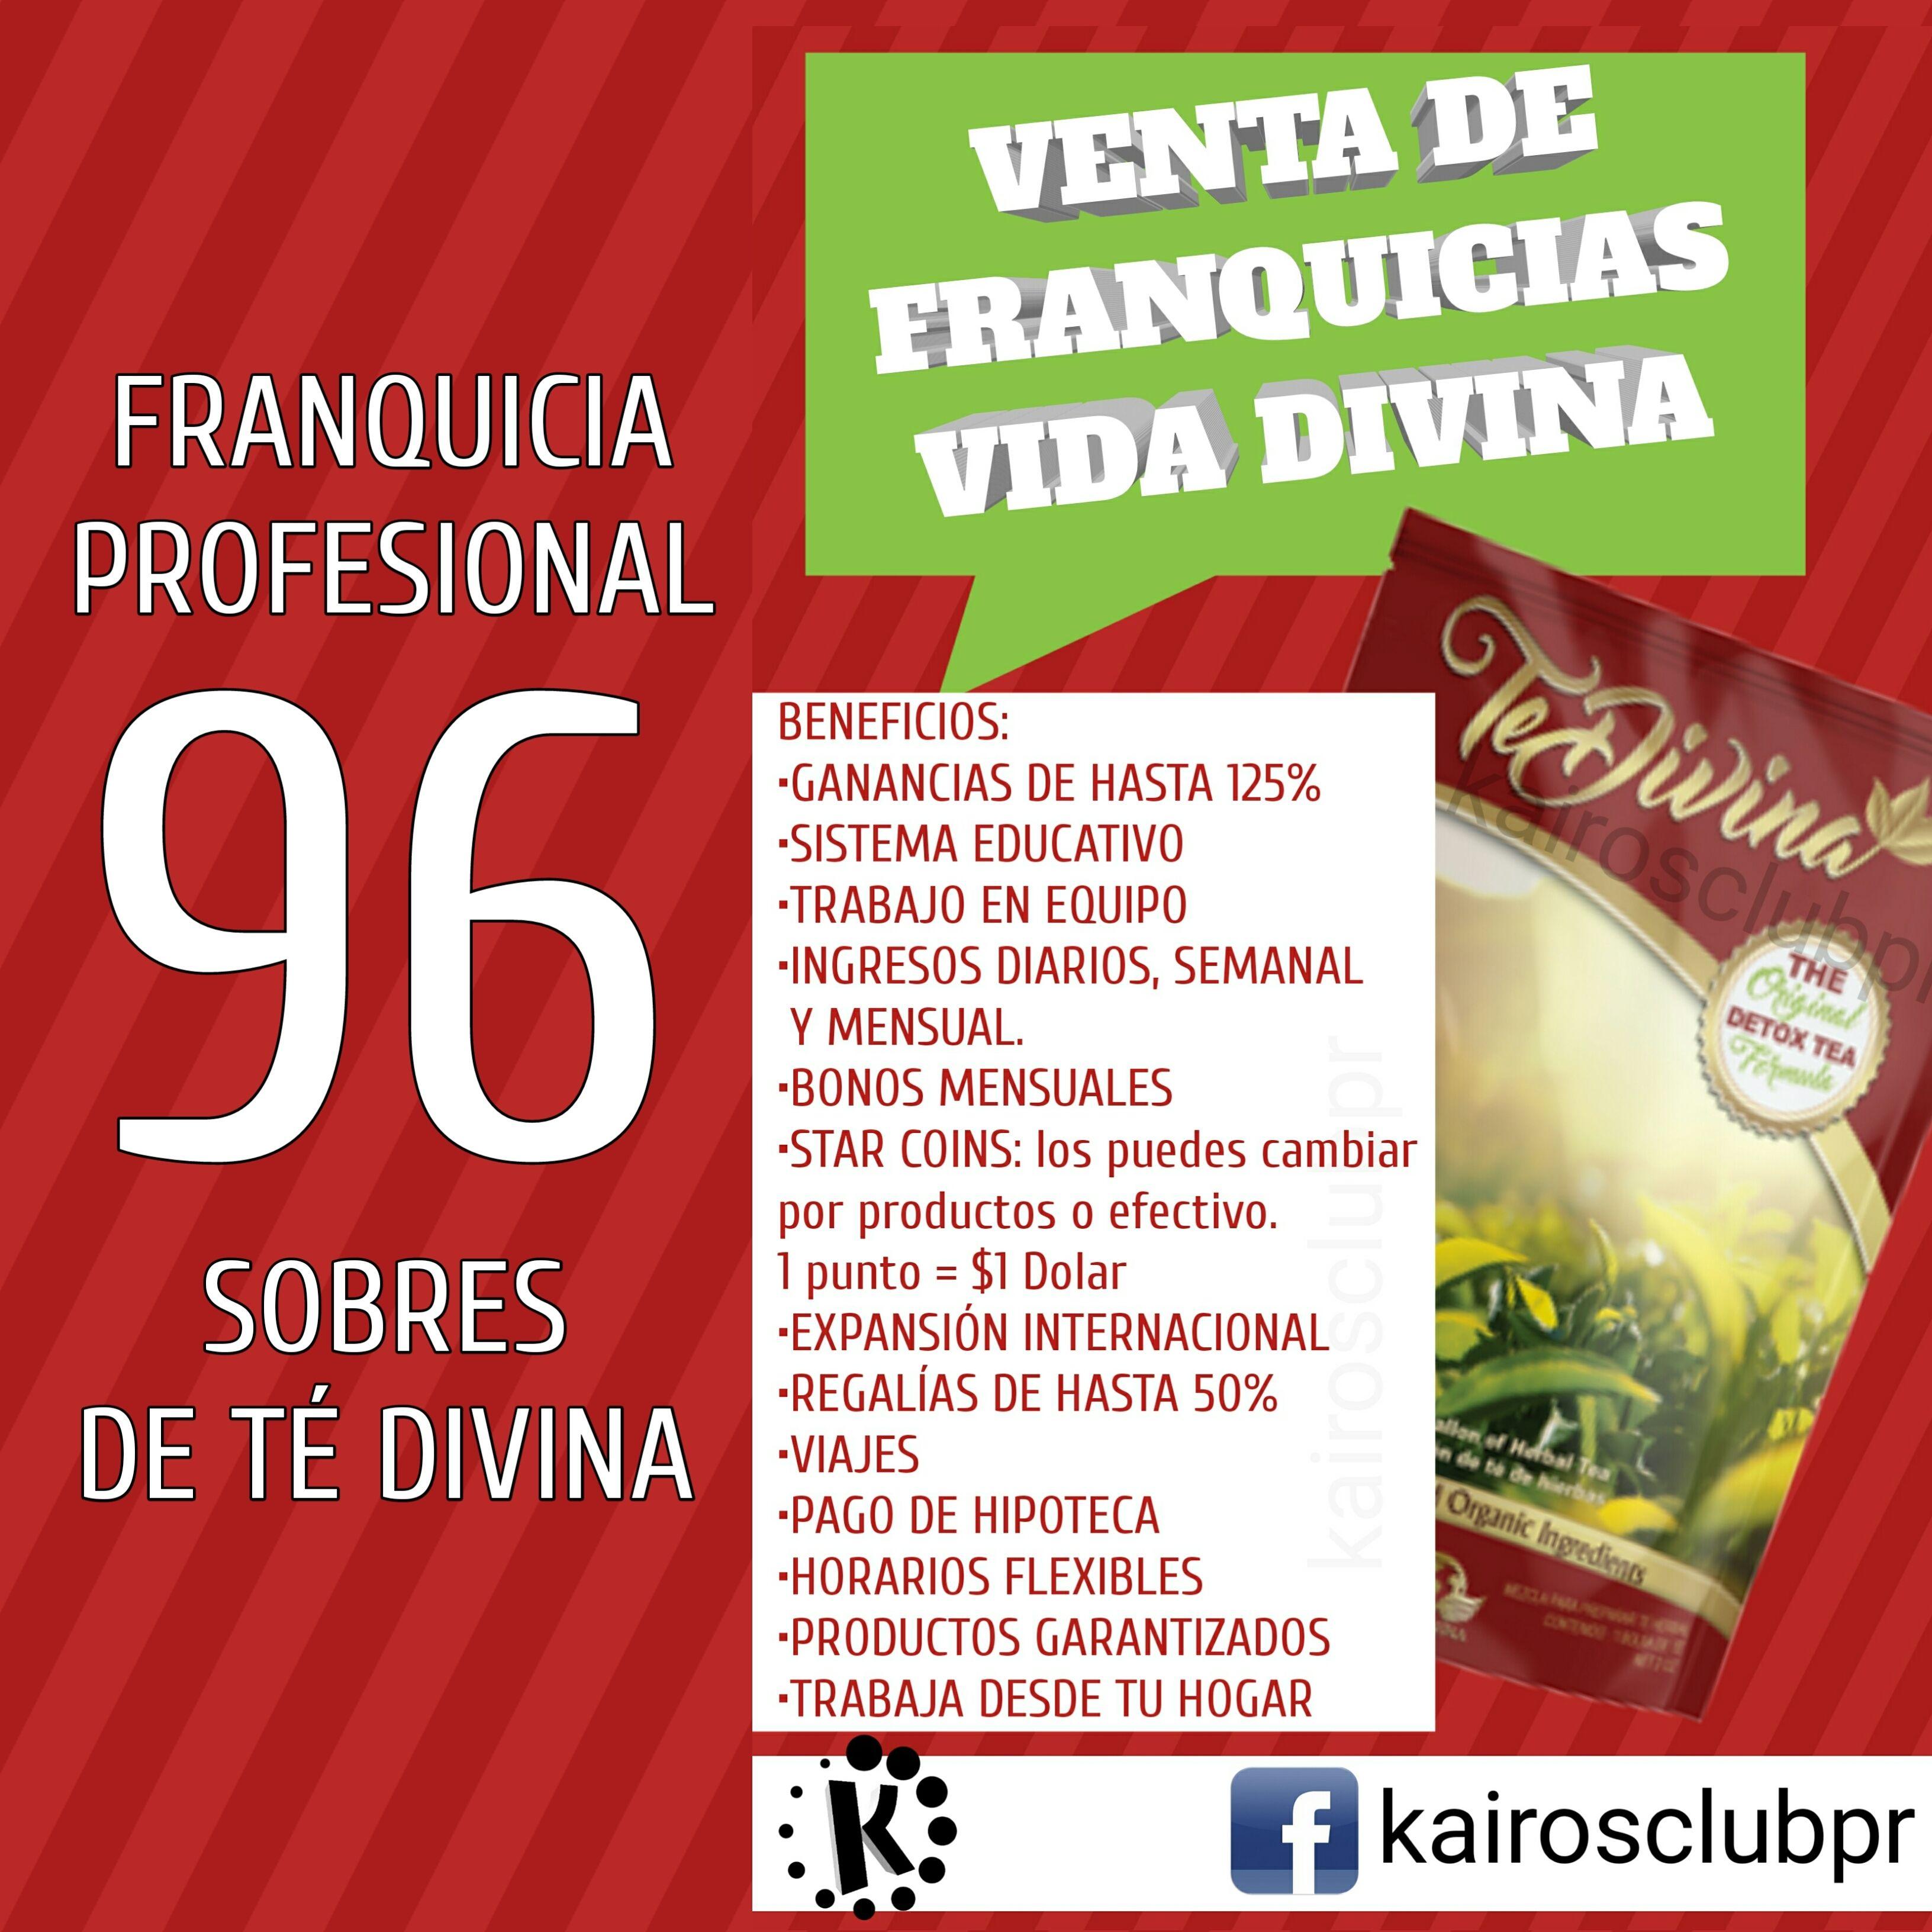 96 sobres de Té Divina | Shop this product here: http://spreesy.com ...